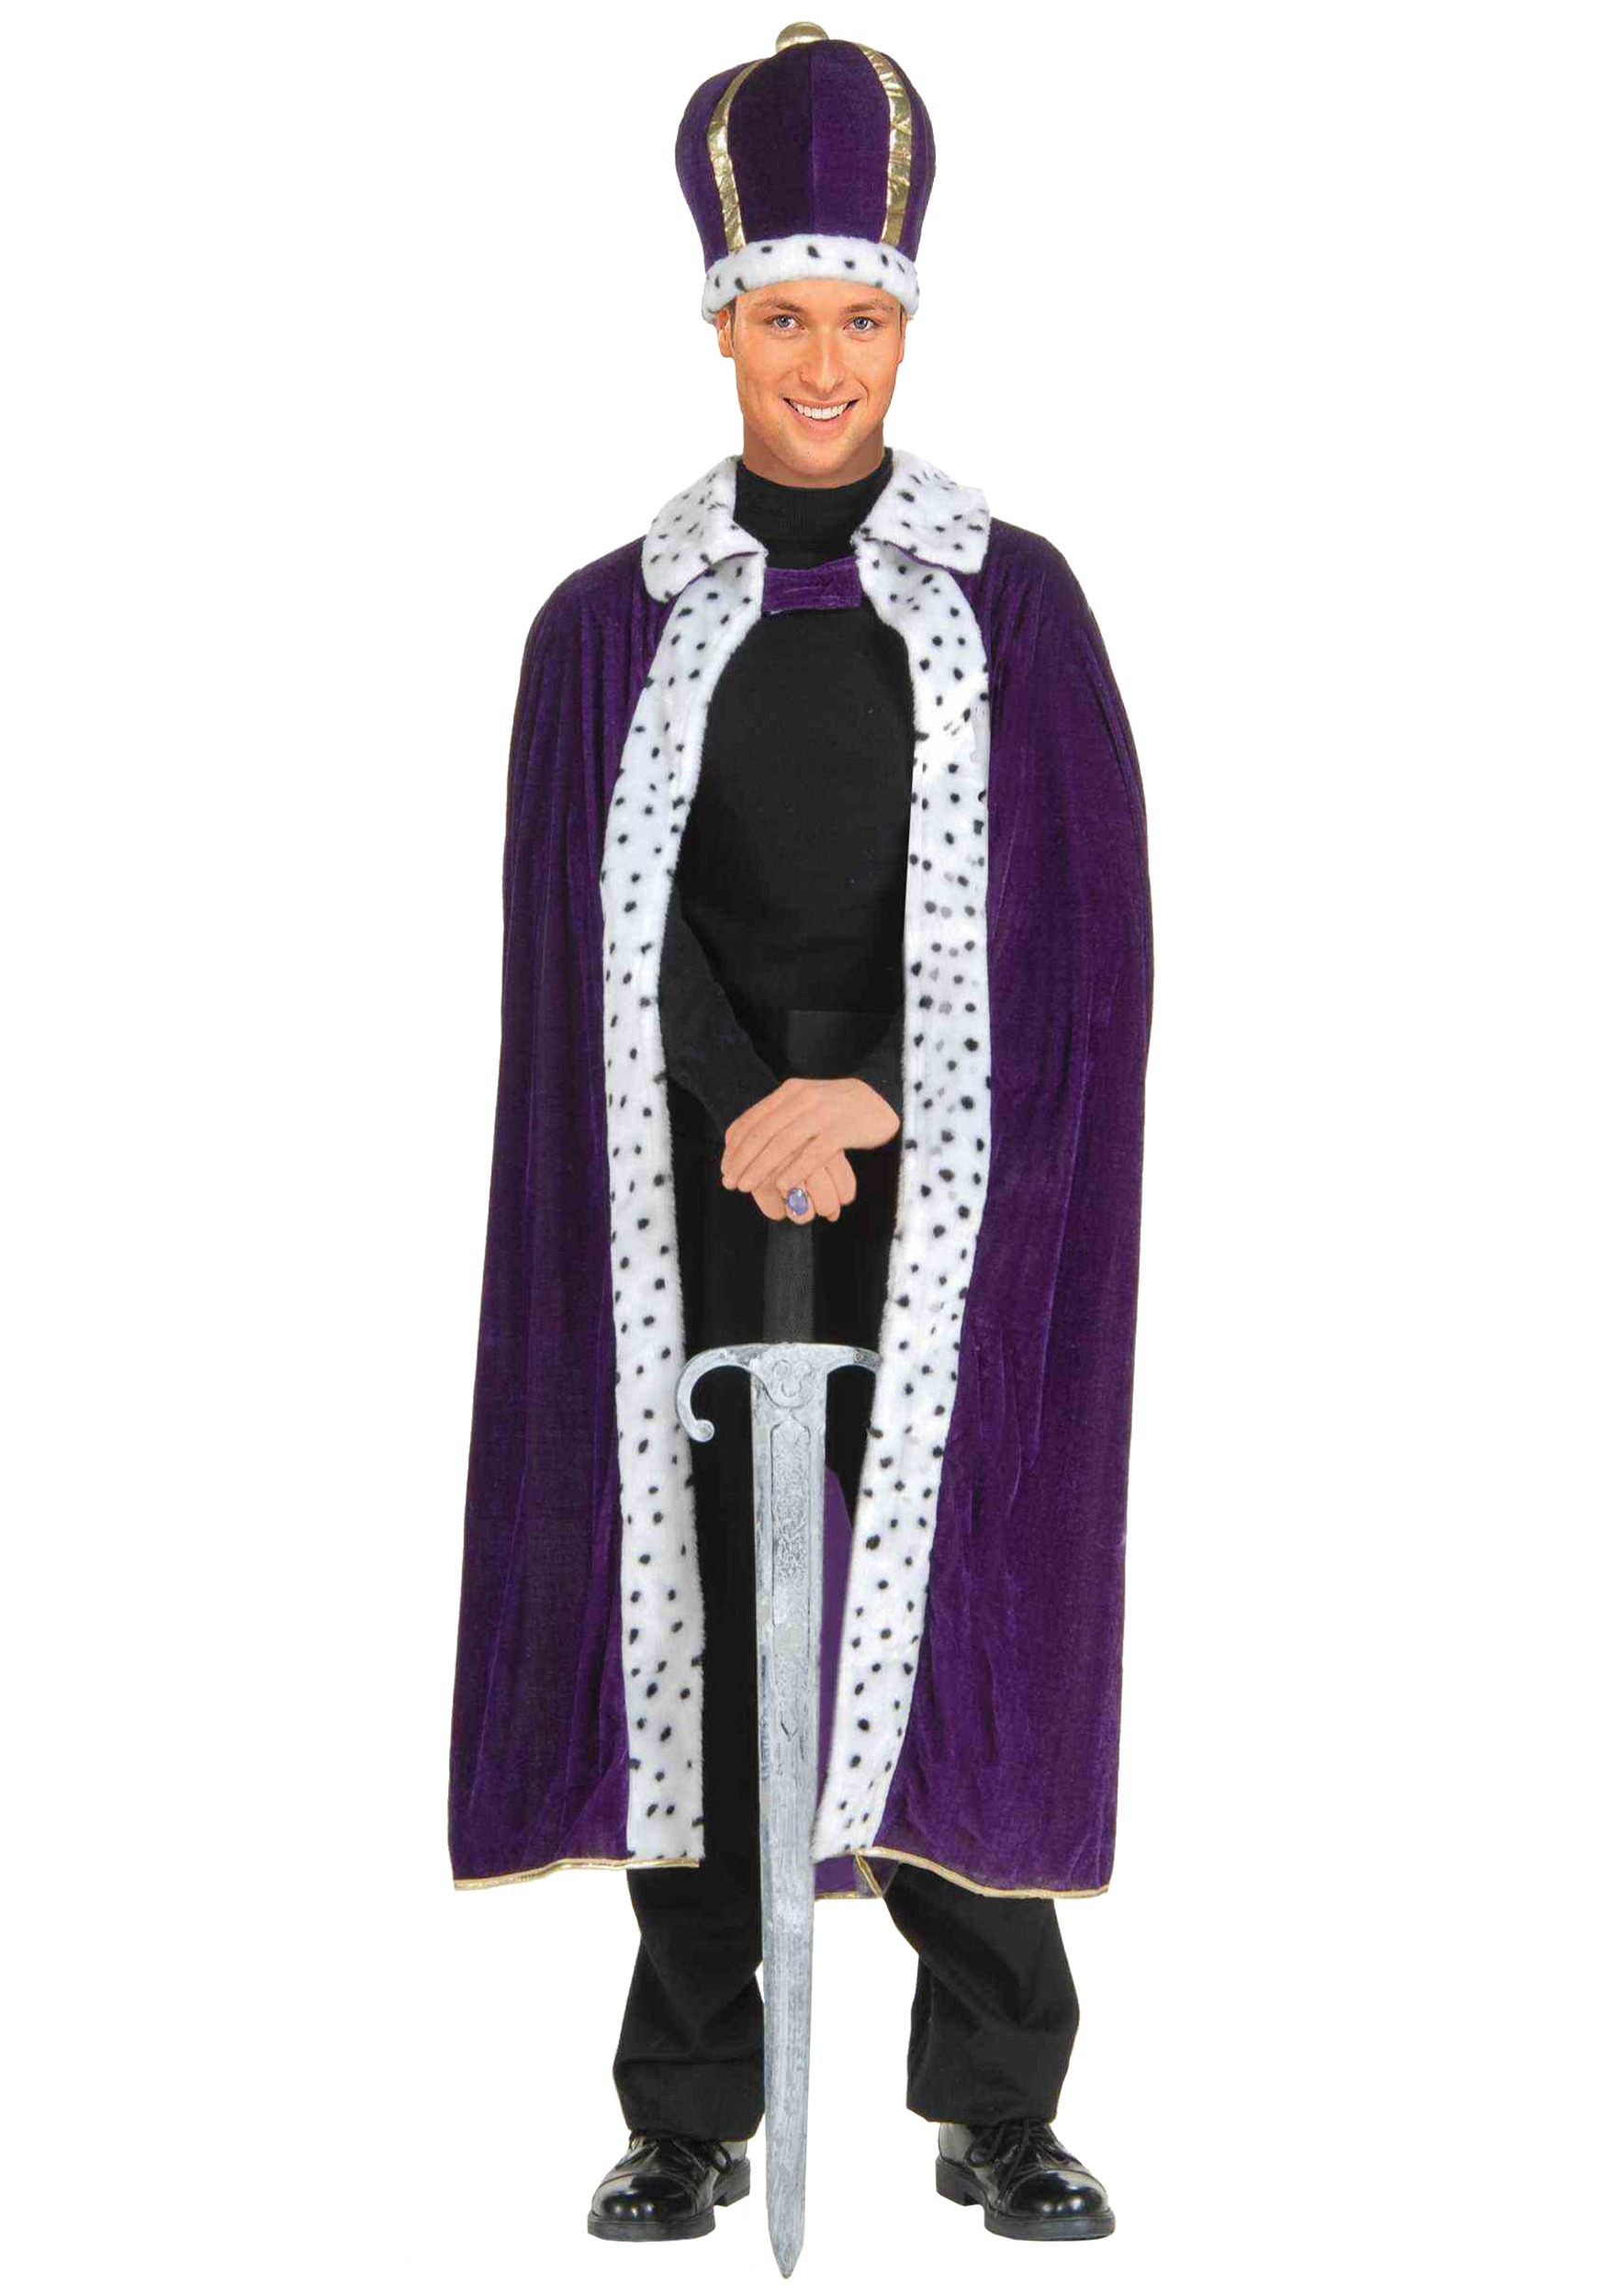 a purple robe